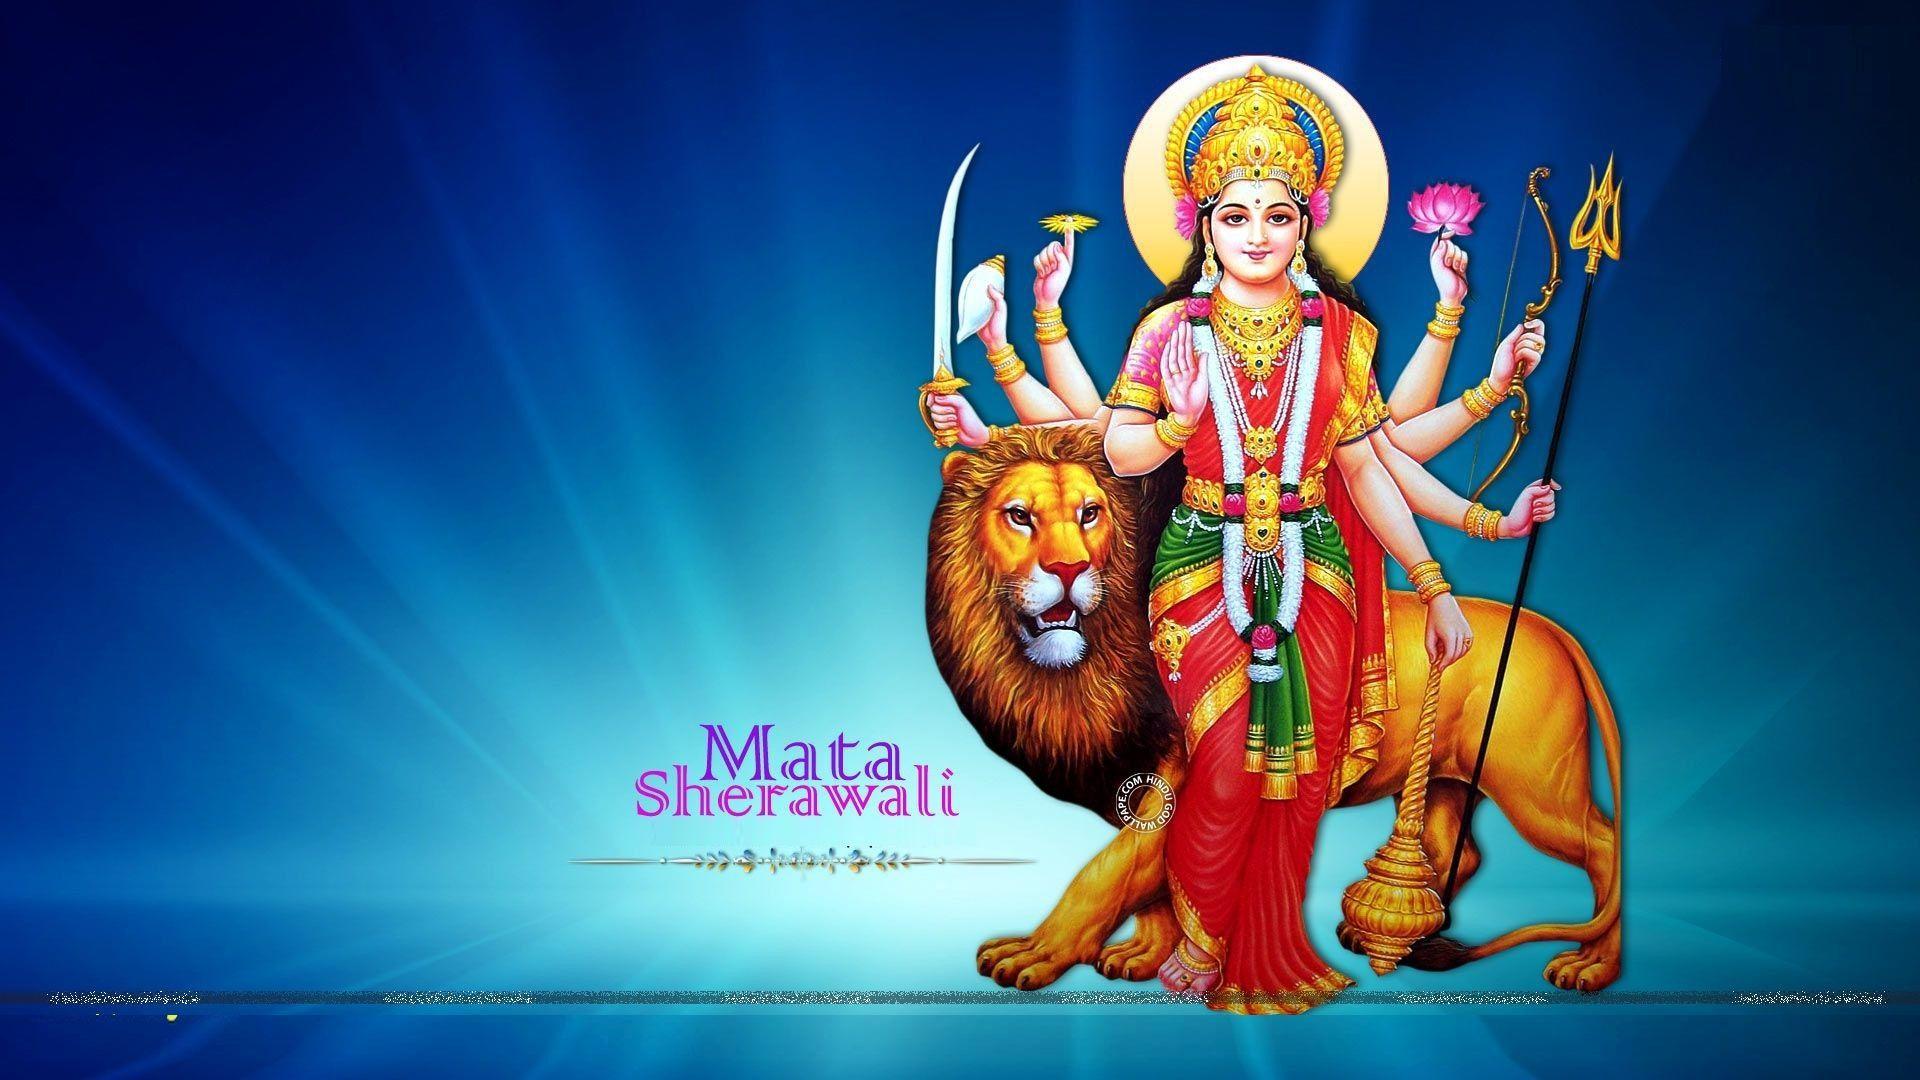 Festivals Maa Durga Navratri Durga Durga Picture Navratri Images